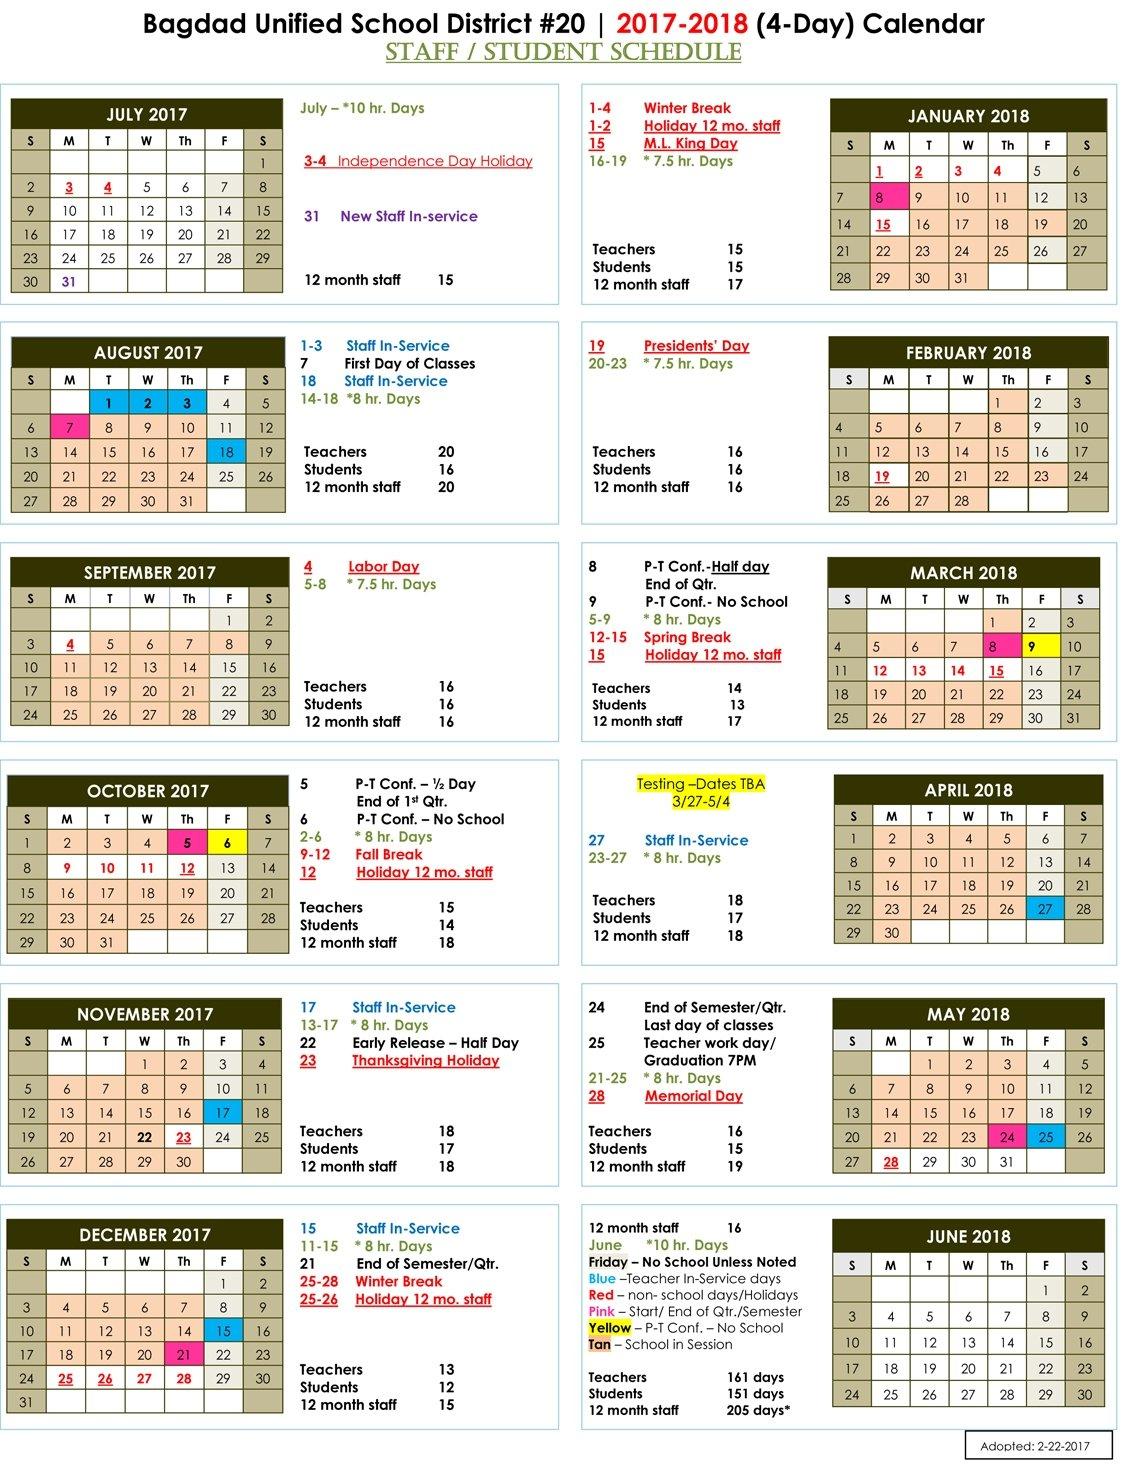 School Calendars 2017 2018 2018 2019 Bagdad Unified Hawaiian Calendar Fishing And Planting